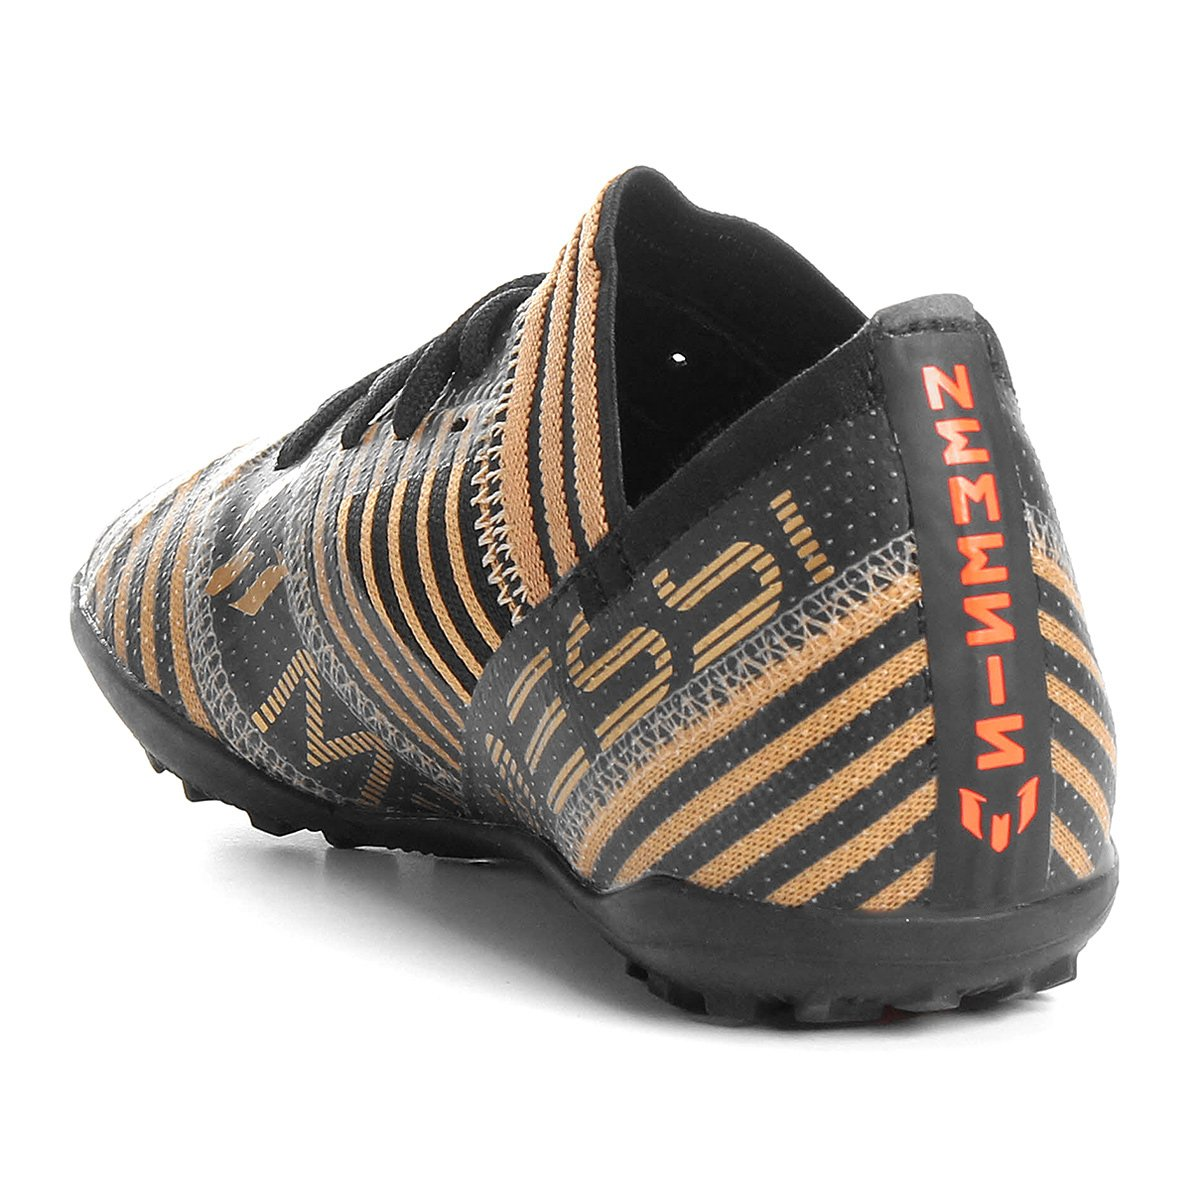 b944edec0f Chuteira Society Adidas Nemezis Messi 17 3 TF Infantil - Compre ...